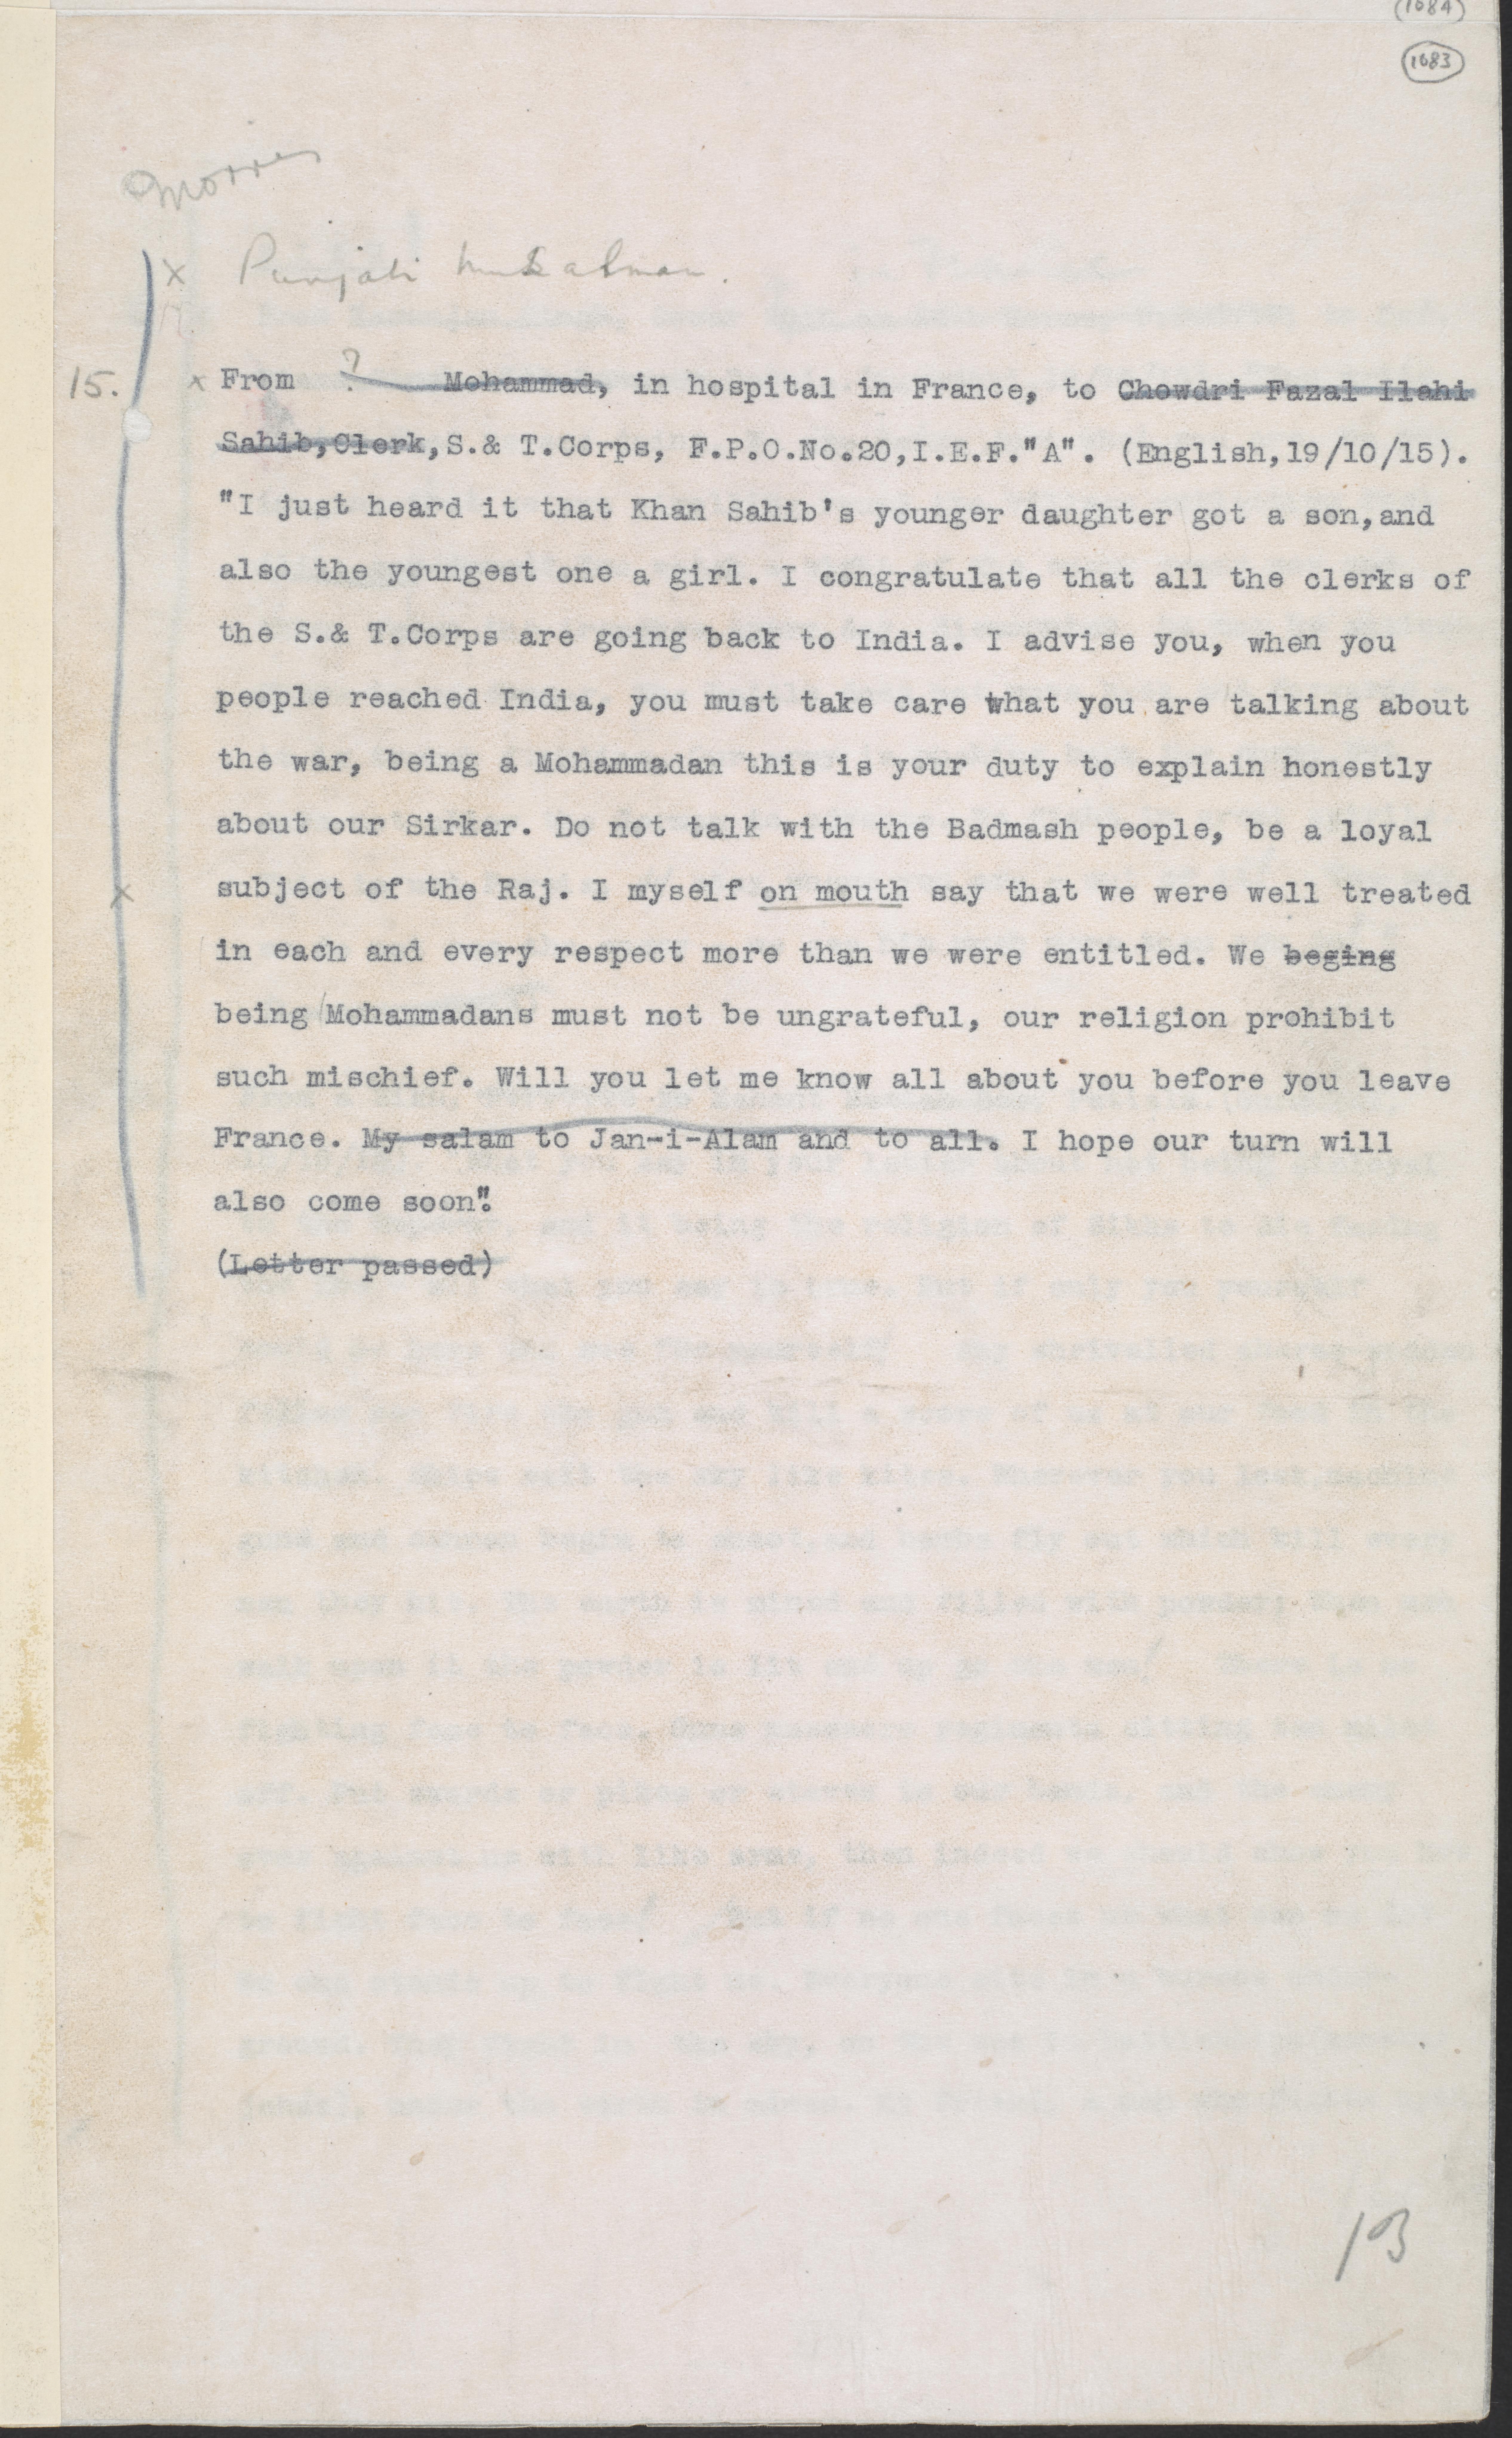 Letter to Sirkar MSS Eur F143 86